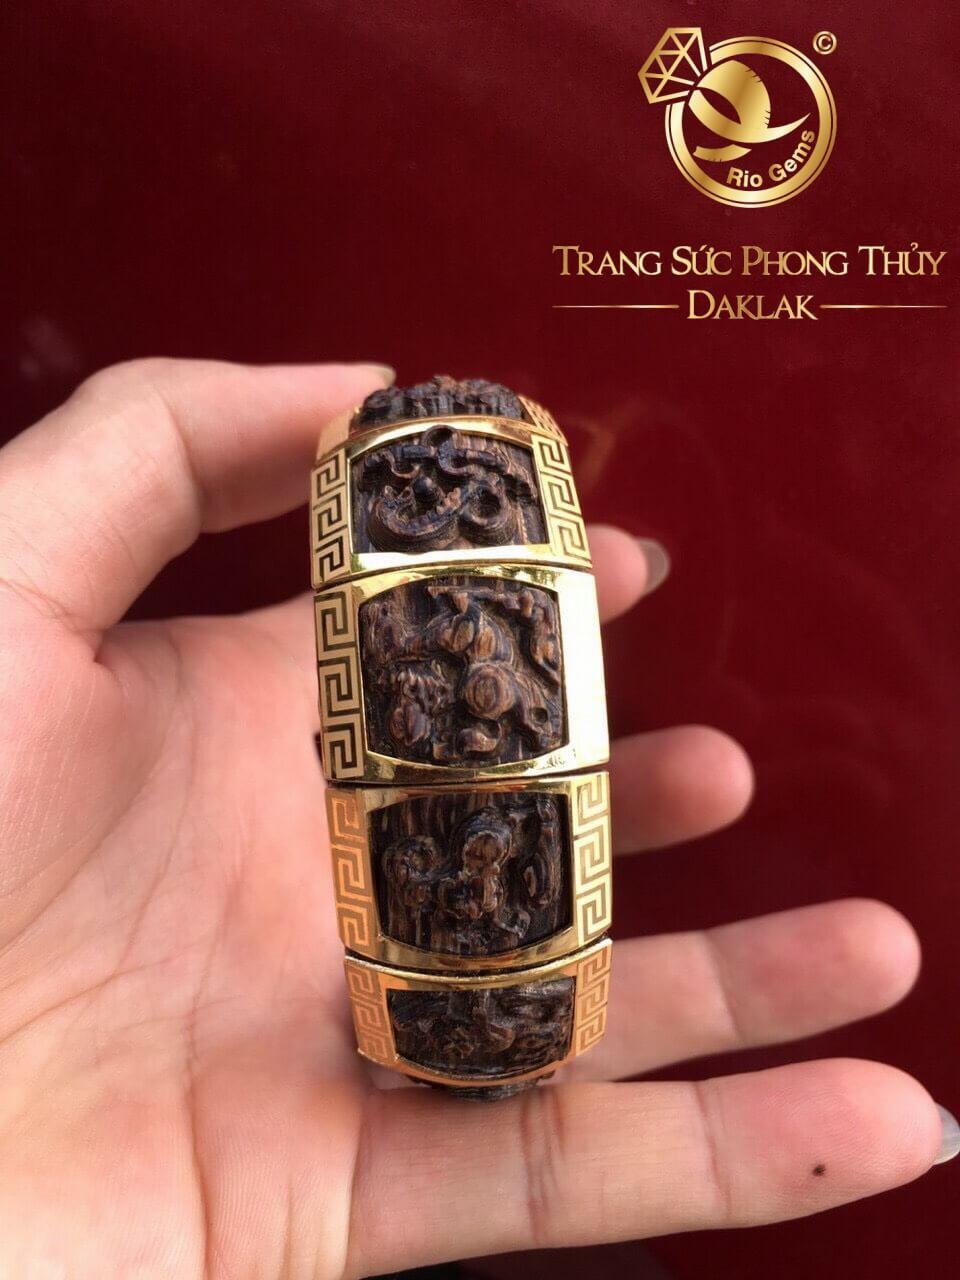 Lac-tay-Tram-Huong-sanh-chim-12-con-giap-phong-thuy-Riogems